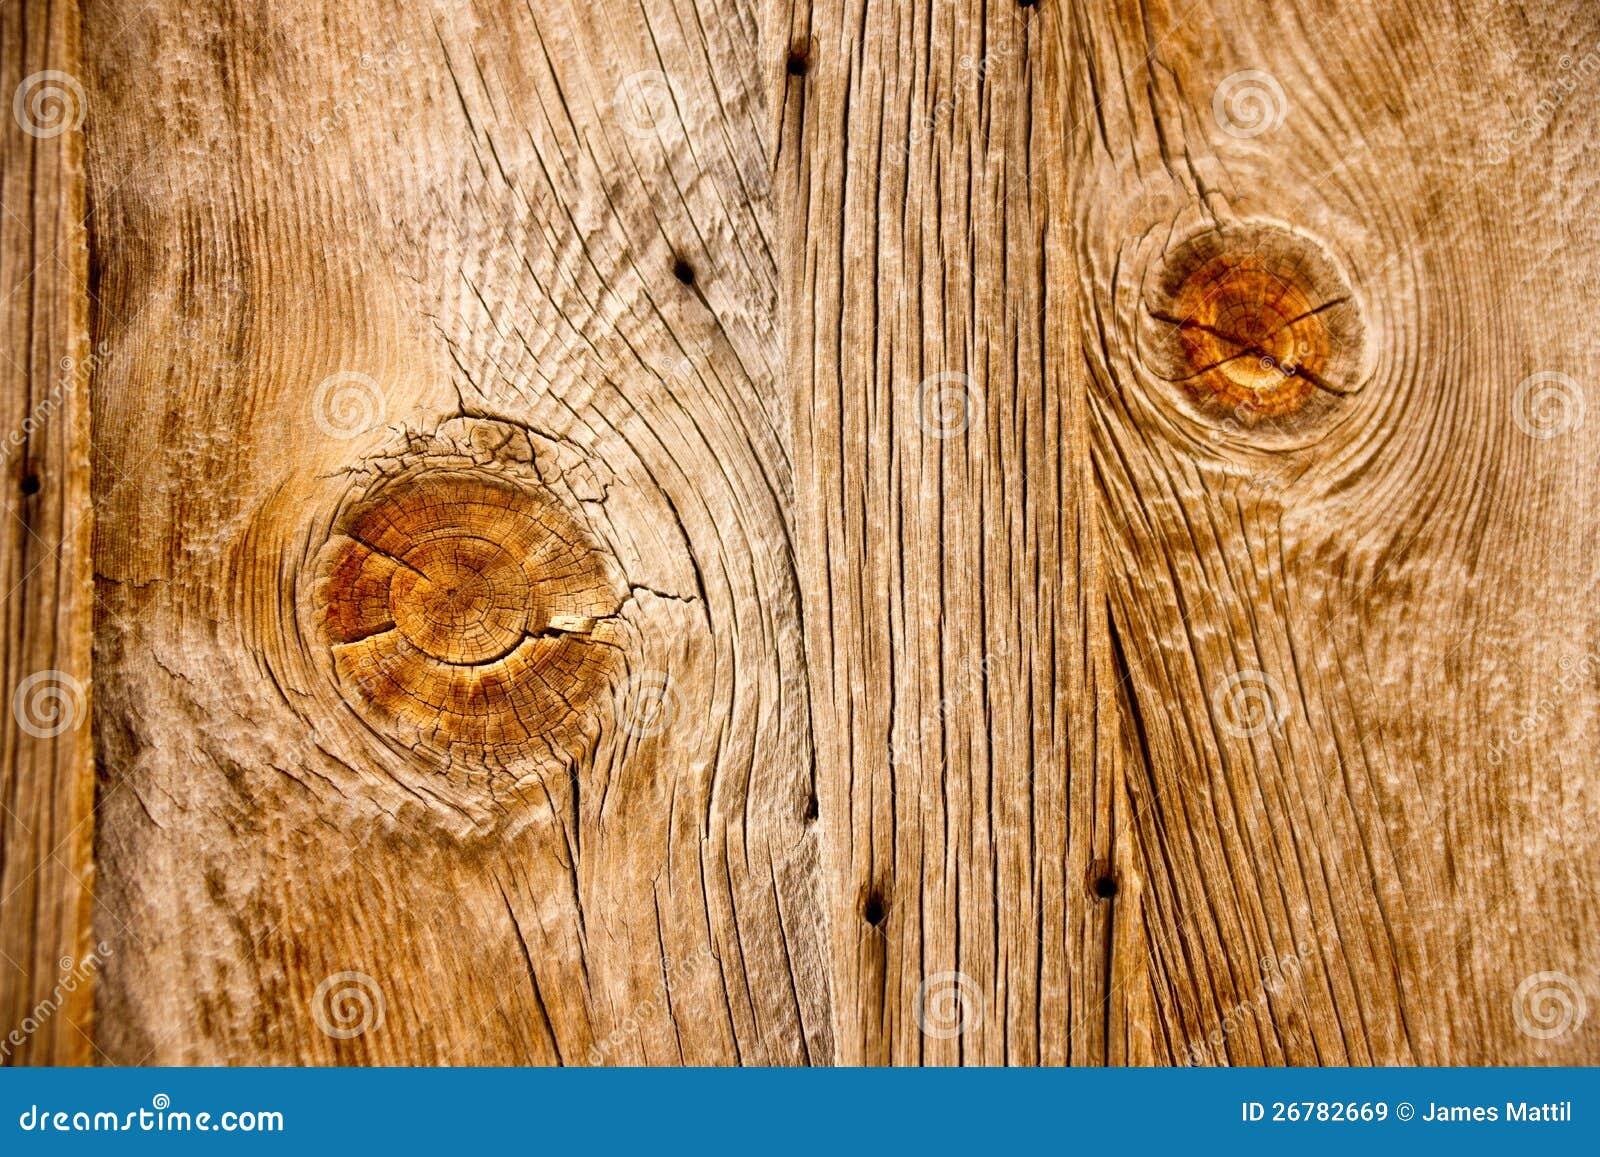 Texturas de madera r sticas imagen de archivo imagen - Estanterias rusticas de madera ...